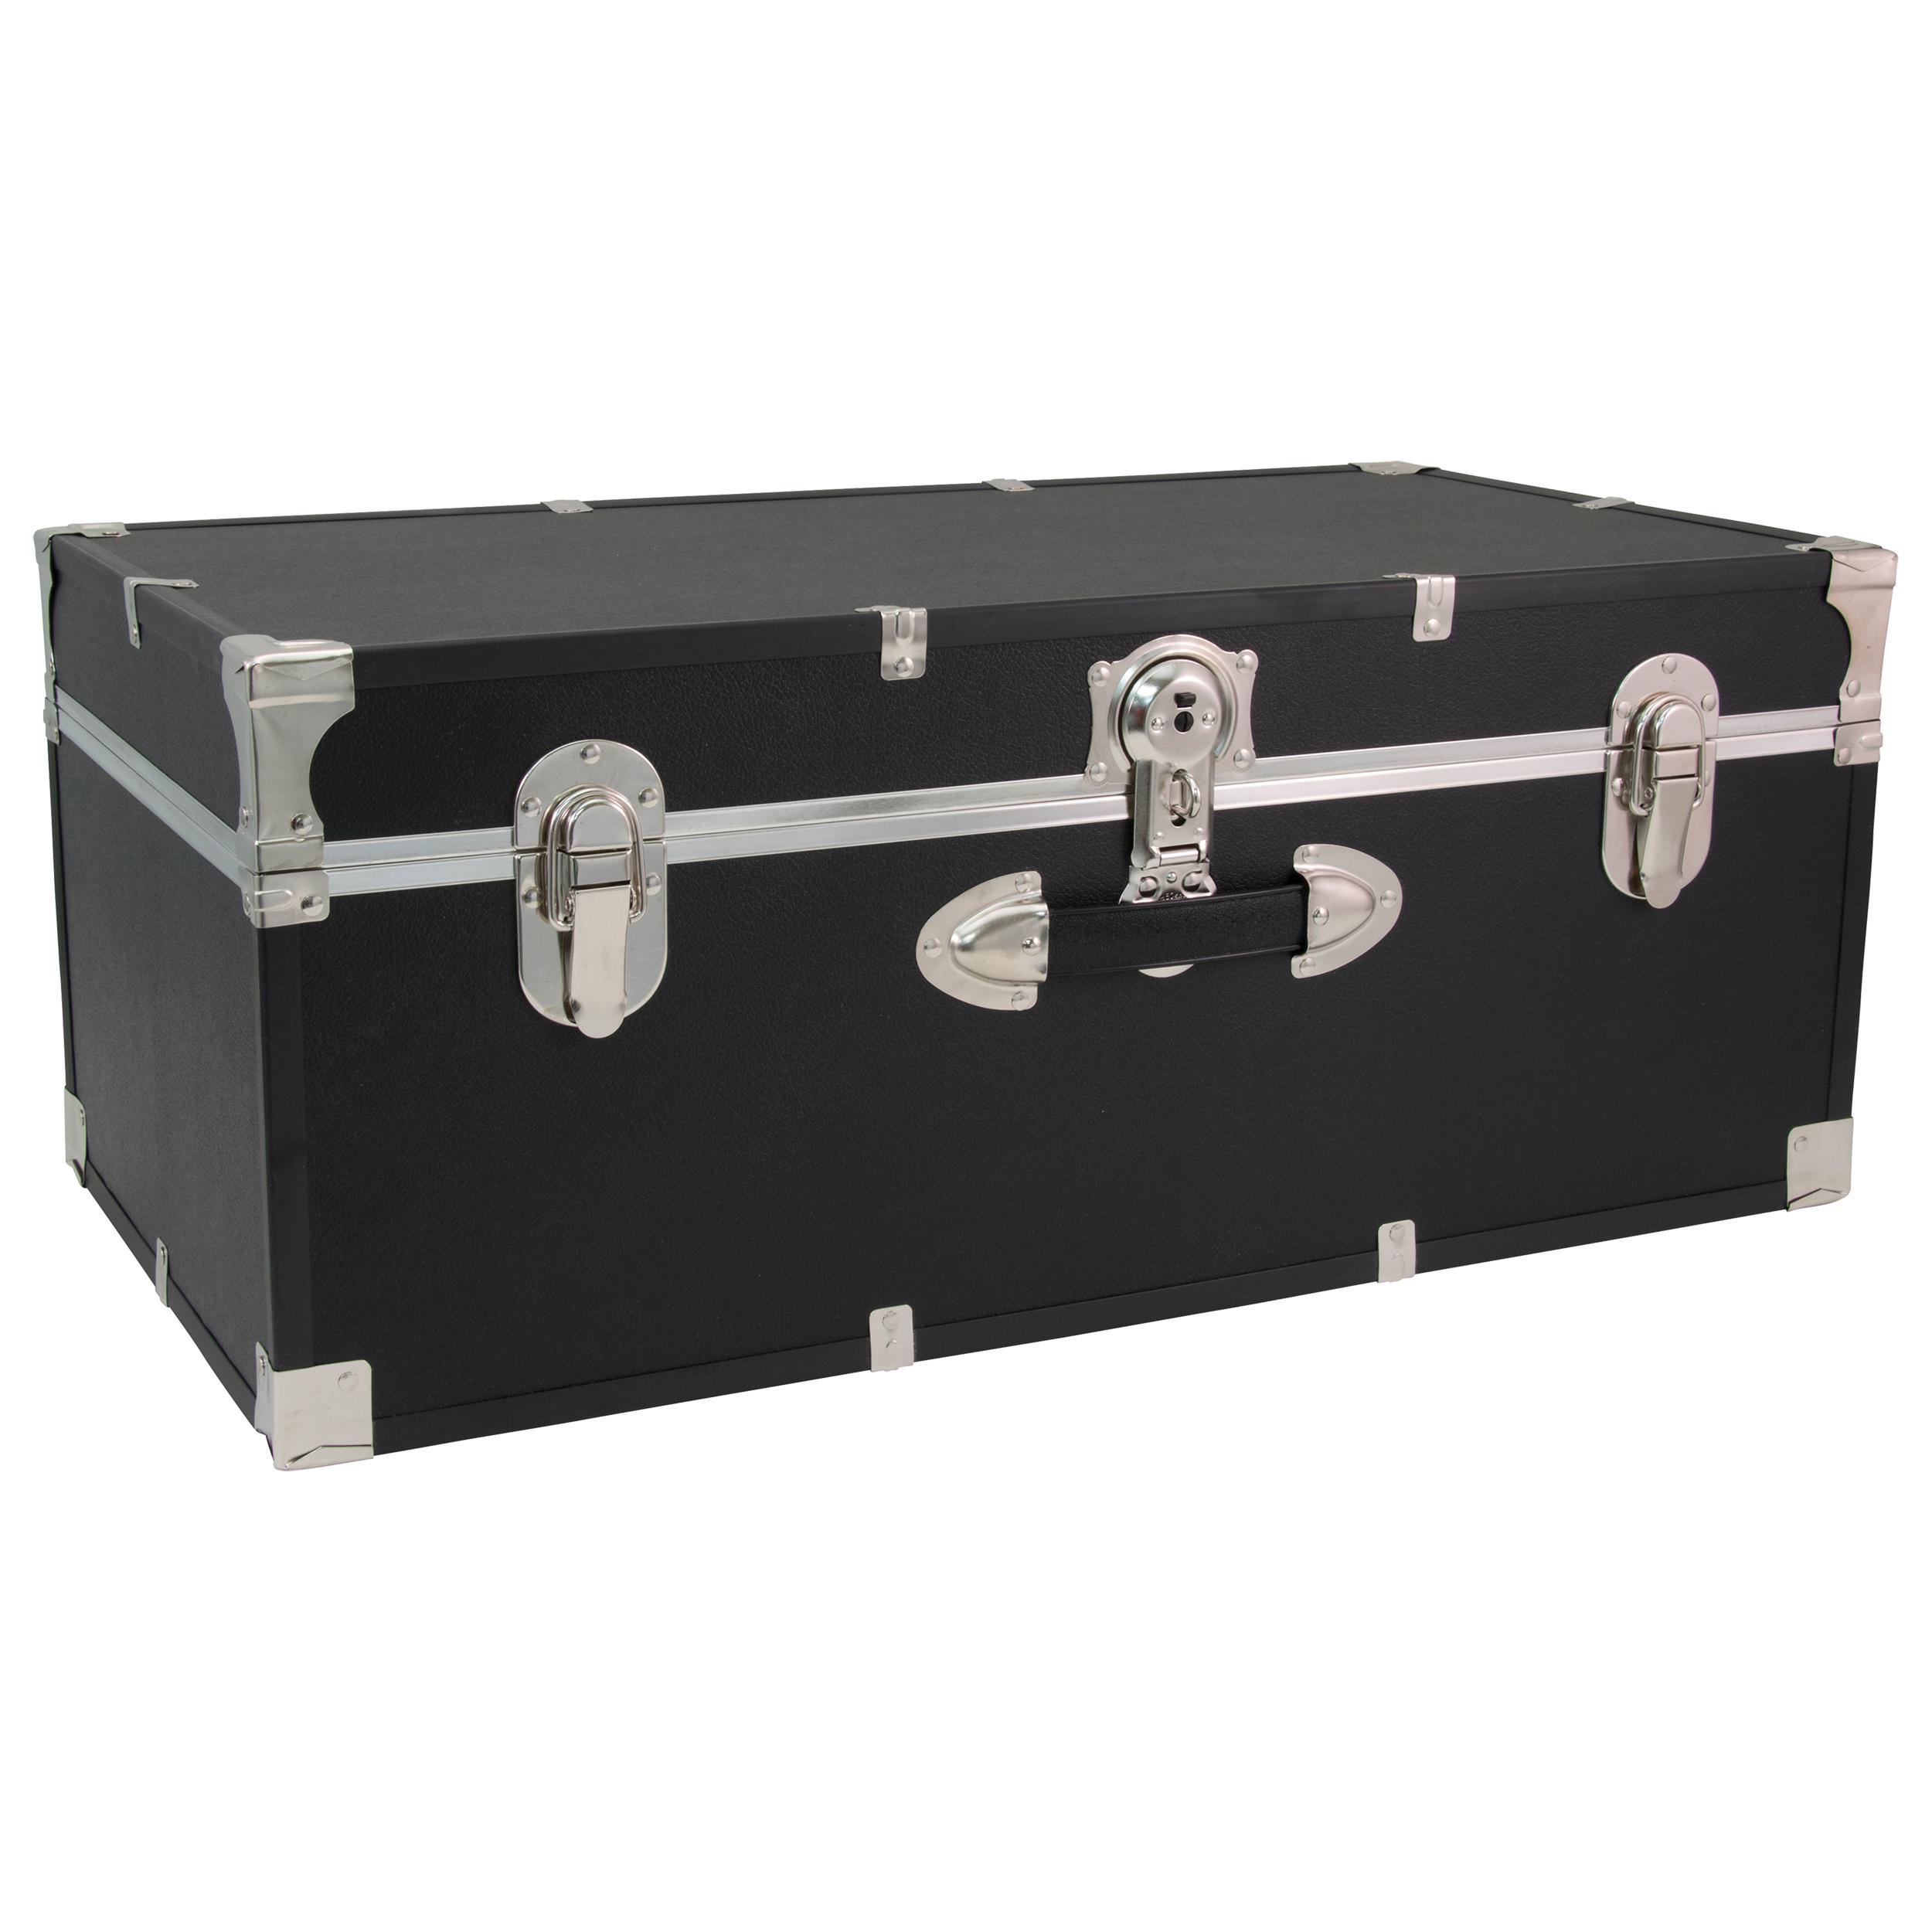 Footlocker Titanium Storage W// Lid Case of 2 Durable Home Bedroom Organizer